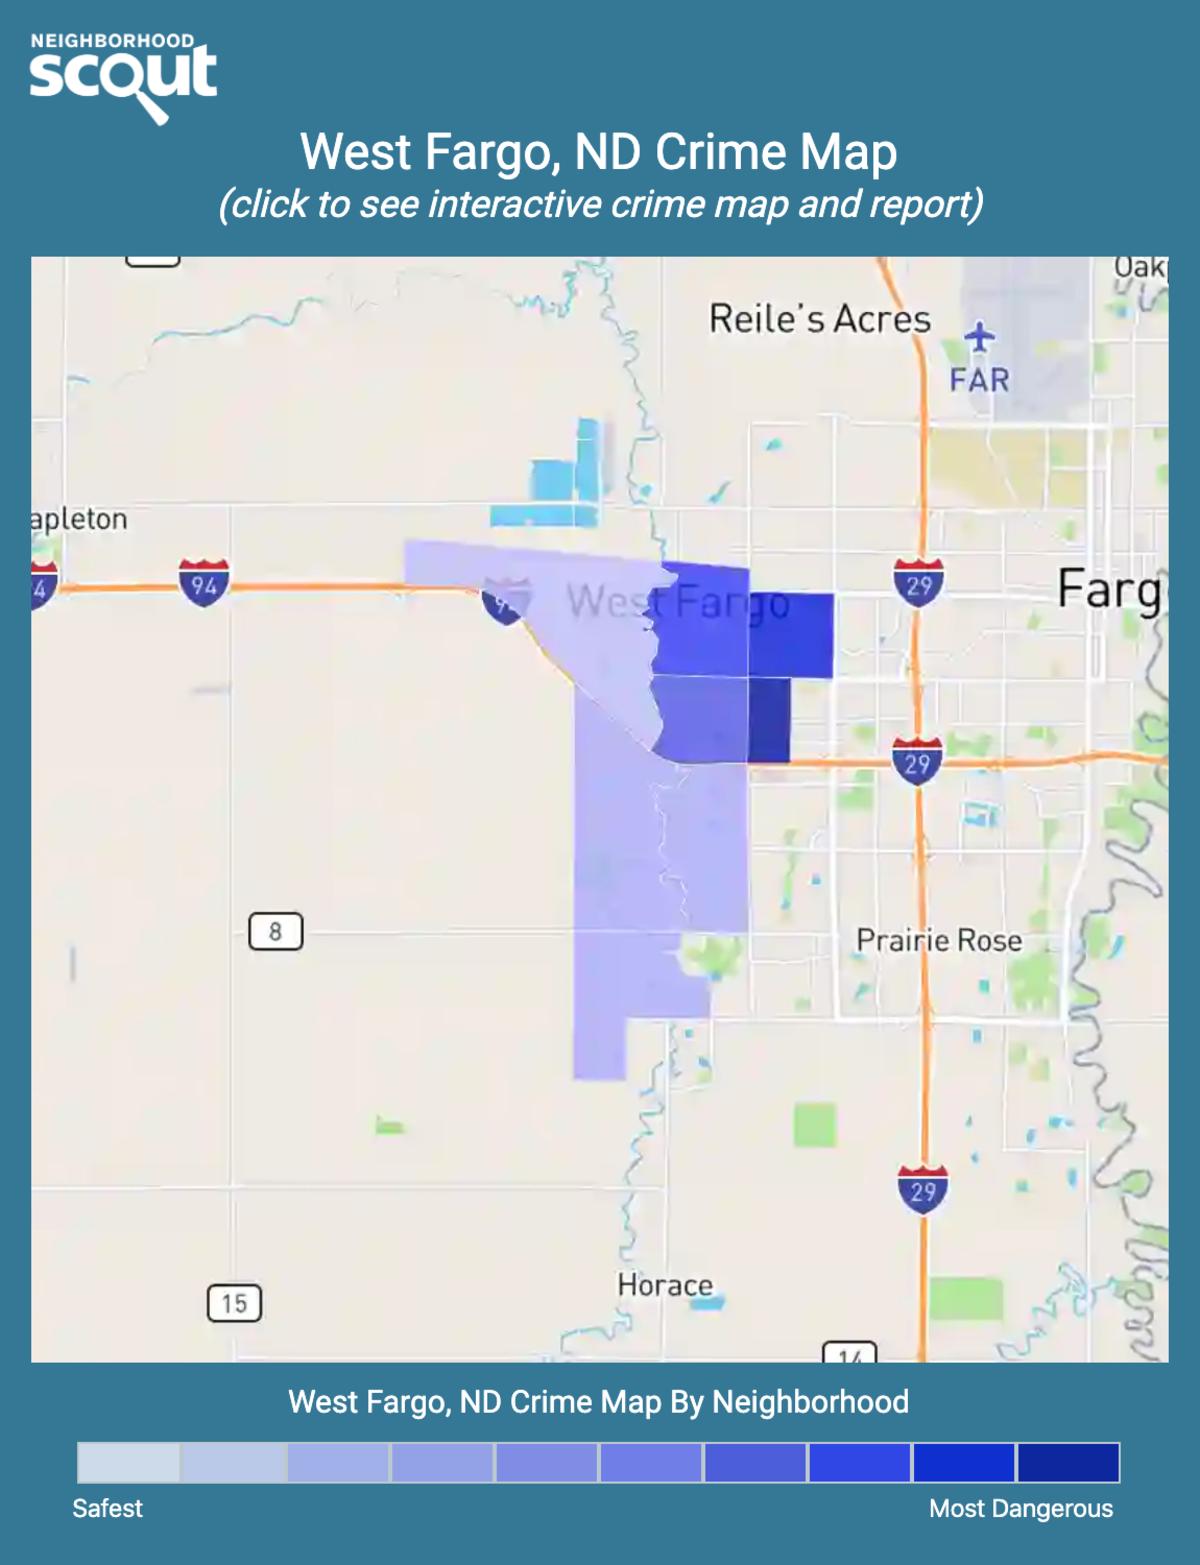 West Fargo, North Dakota crime map